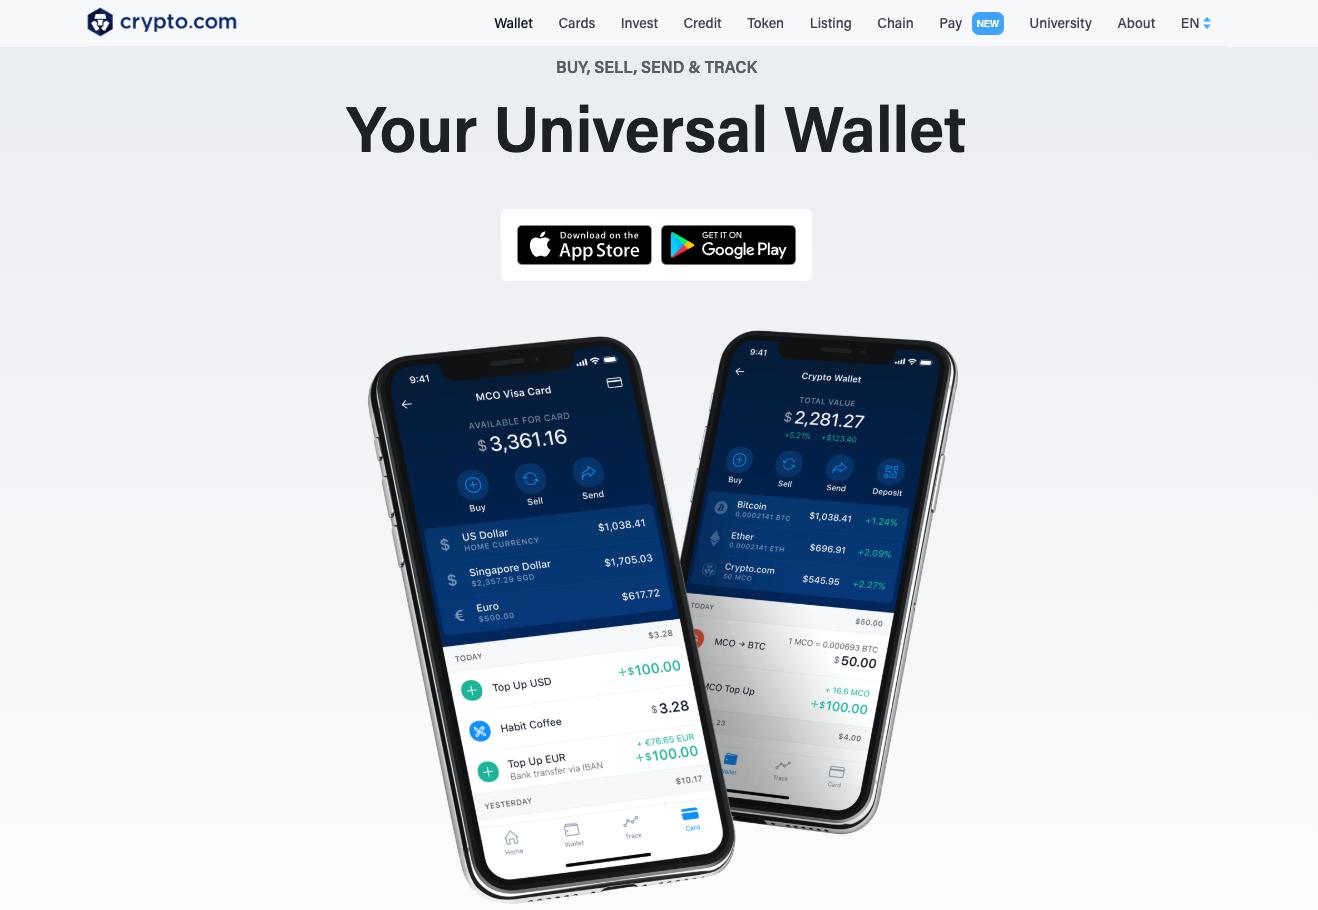 Crypto.com's Universal Wallet